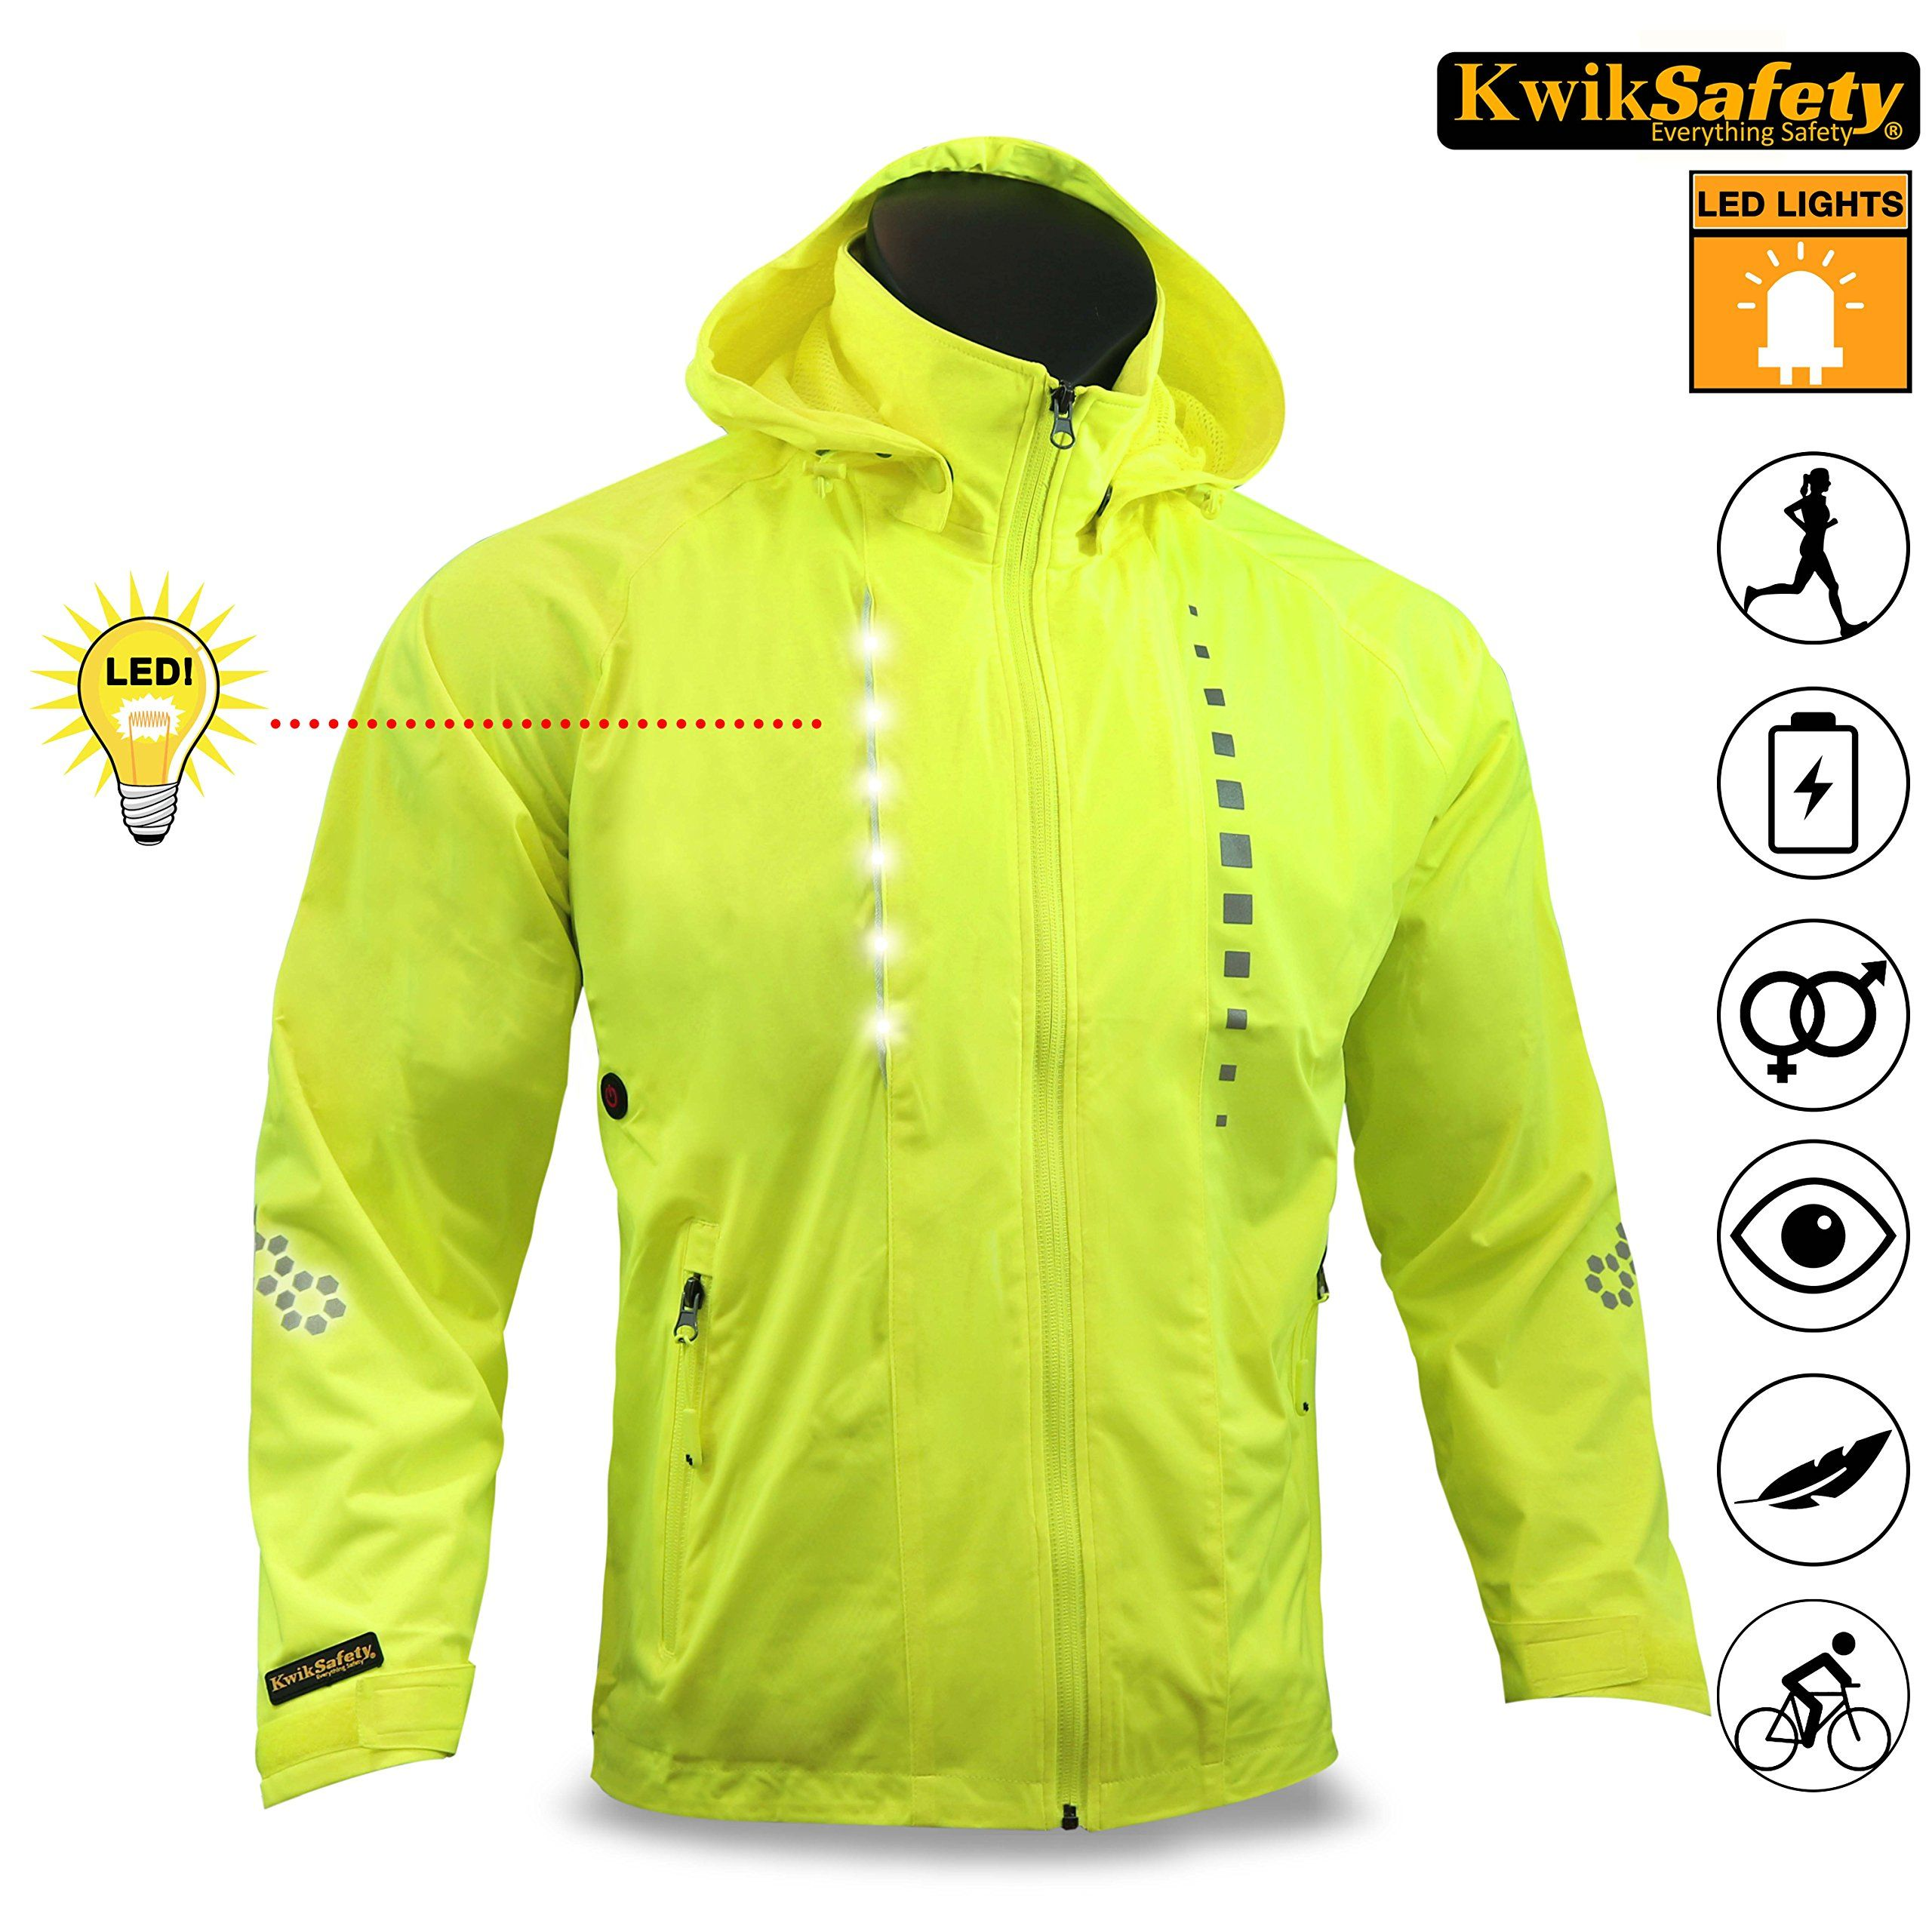 Kwiksafety Firefly Racing Led Cycling Jacket Hi Vis Reflective Luminous Biker Safety Breathable Lightweight Waterp Cycling Jackets Cycling Jacket Jackets